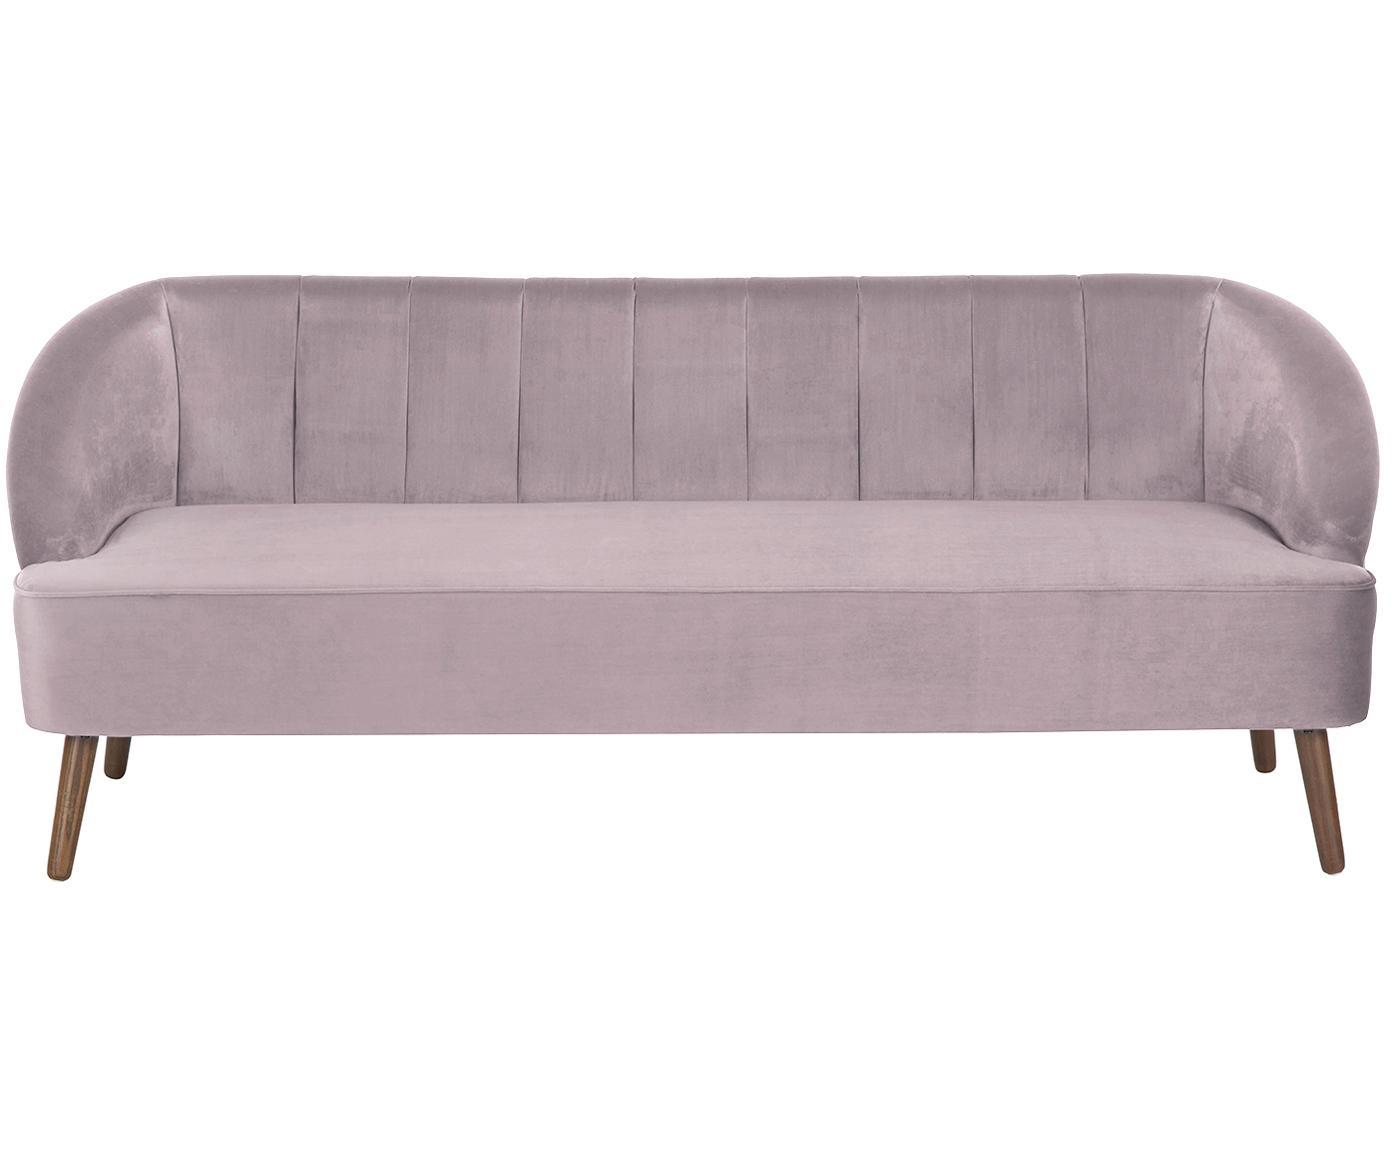 Samt-Sofa Cora (3-Sitzer), Bezug: Samt (Polyester) 28.000 S, Gestell: Kiefernholz, Füße: Kautschukholz, Samt Mauve, 192 x 74 cm